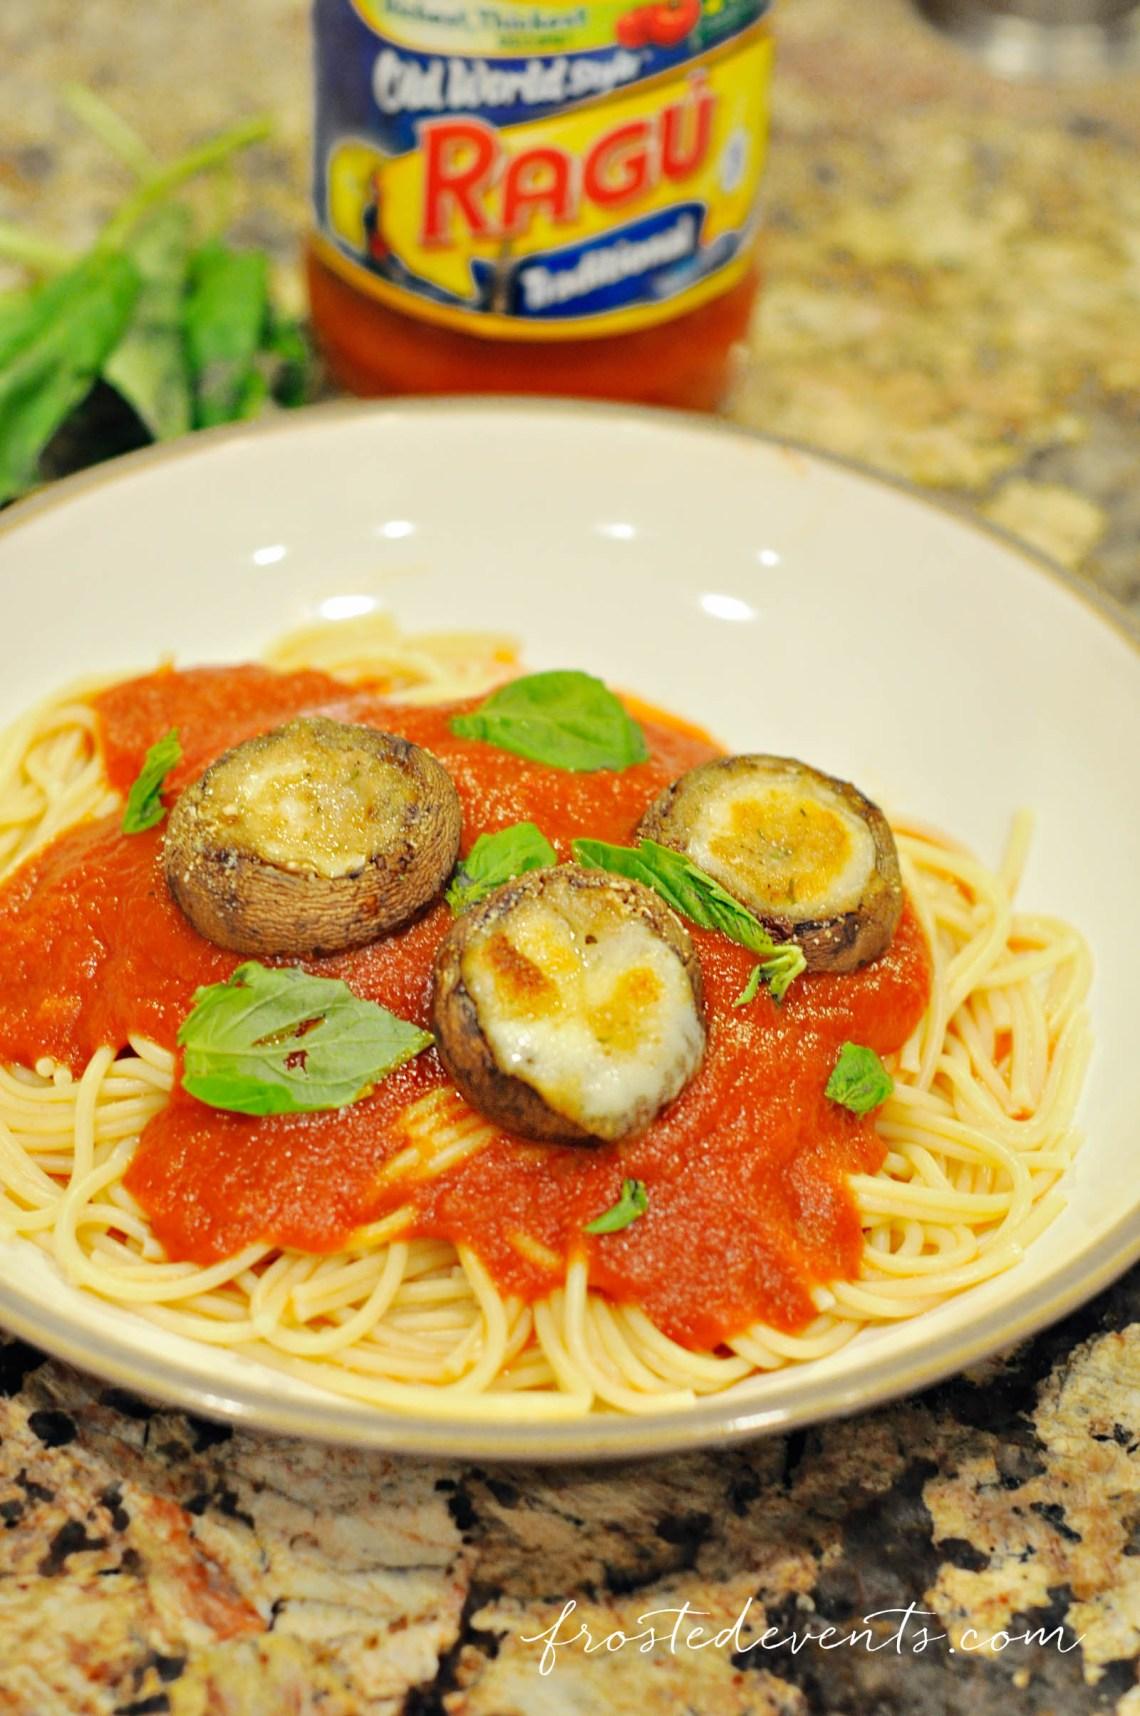 Ragu Recipe Easy Stuffed Mushrooms Recipe with Mozzarella Dinner Recipes #simmeredintradition